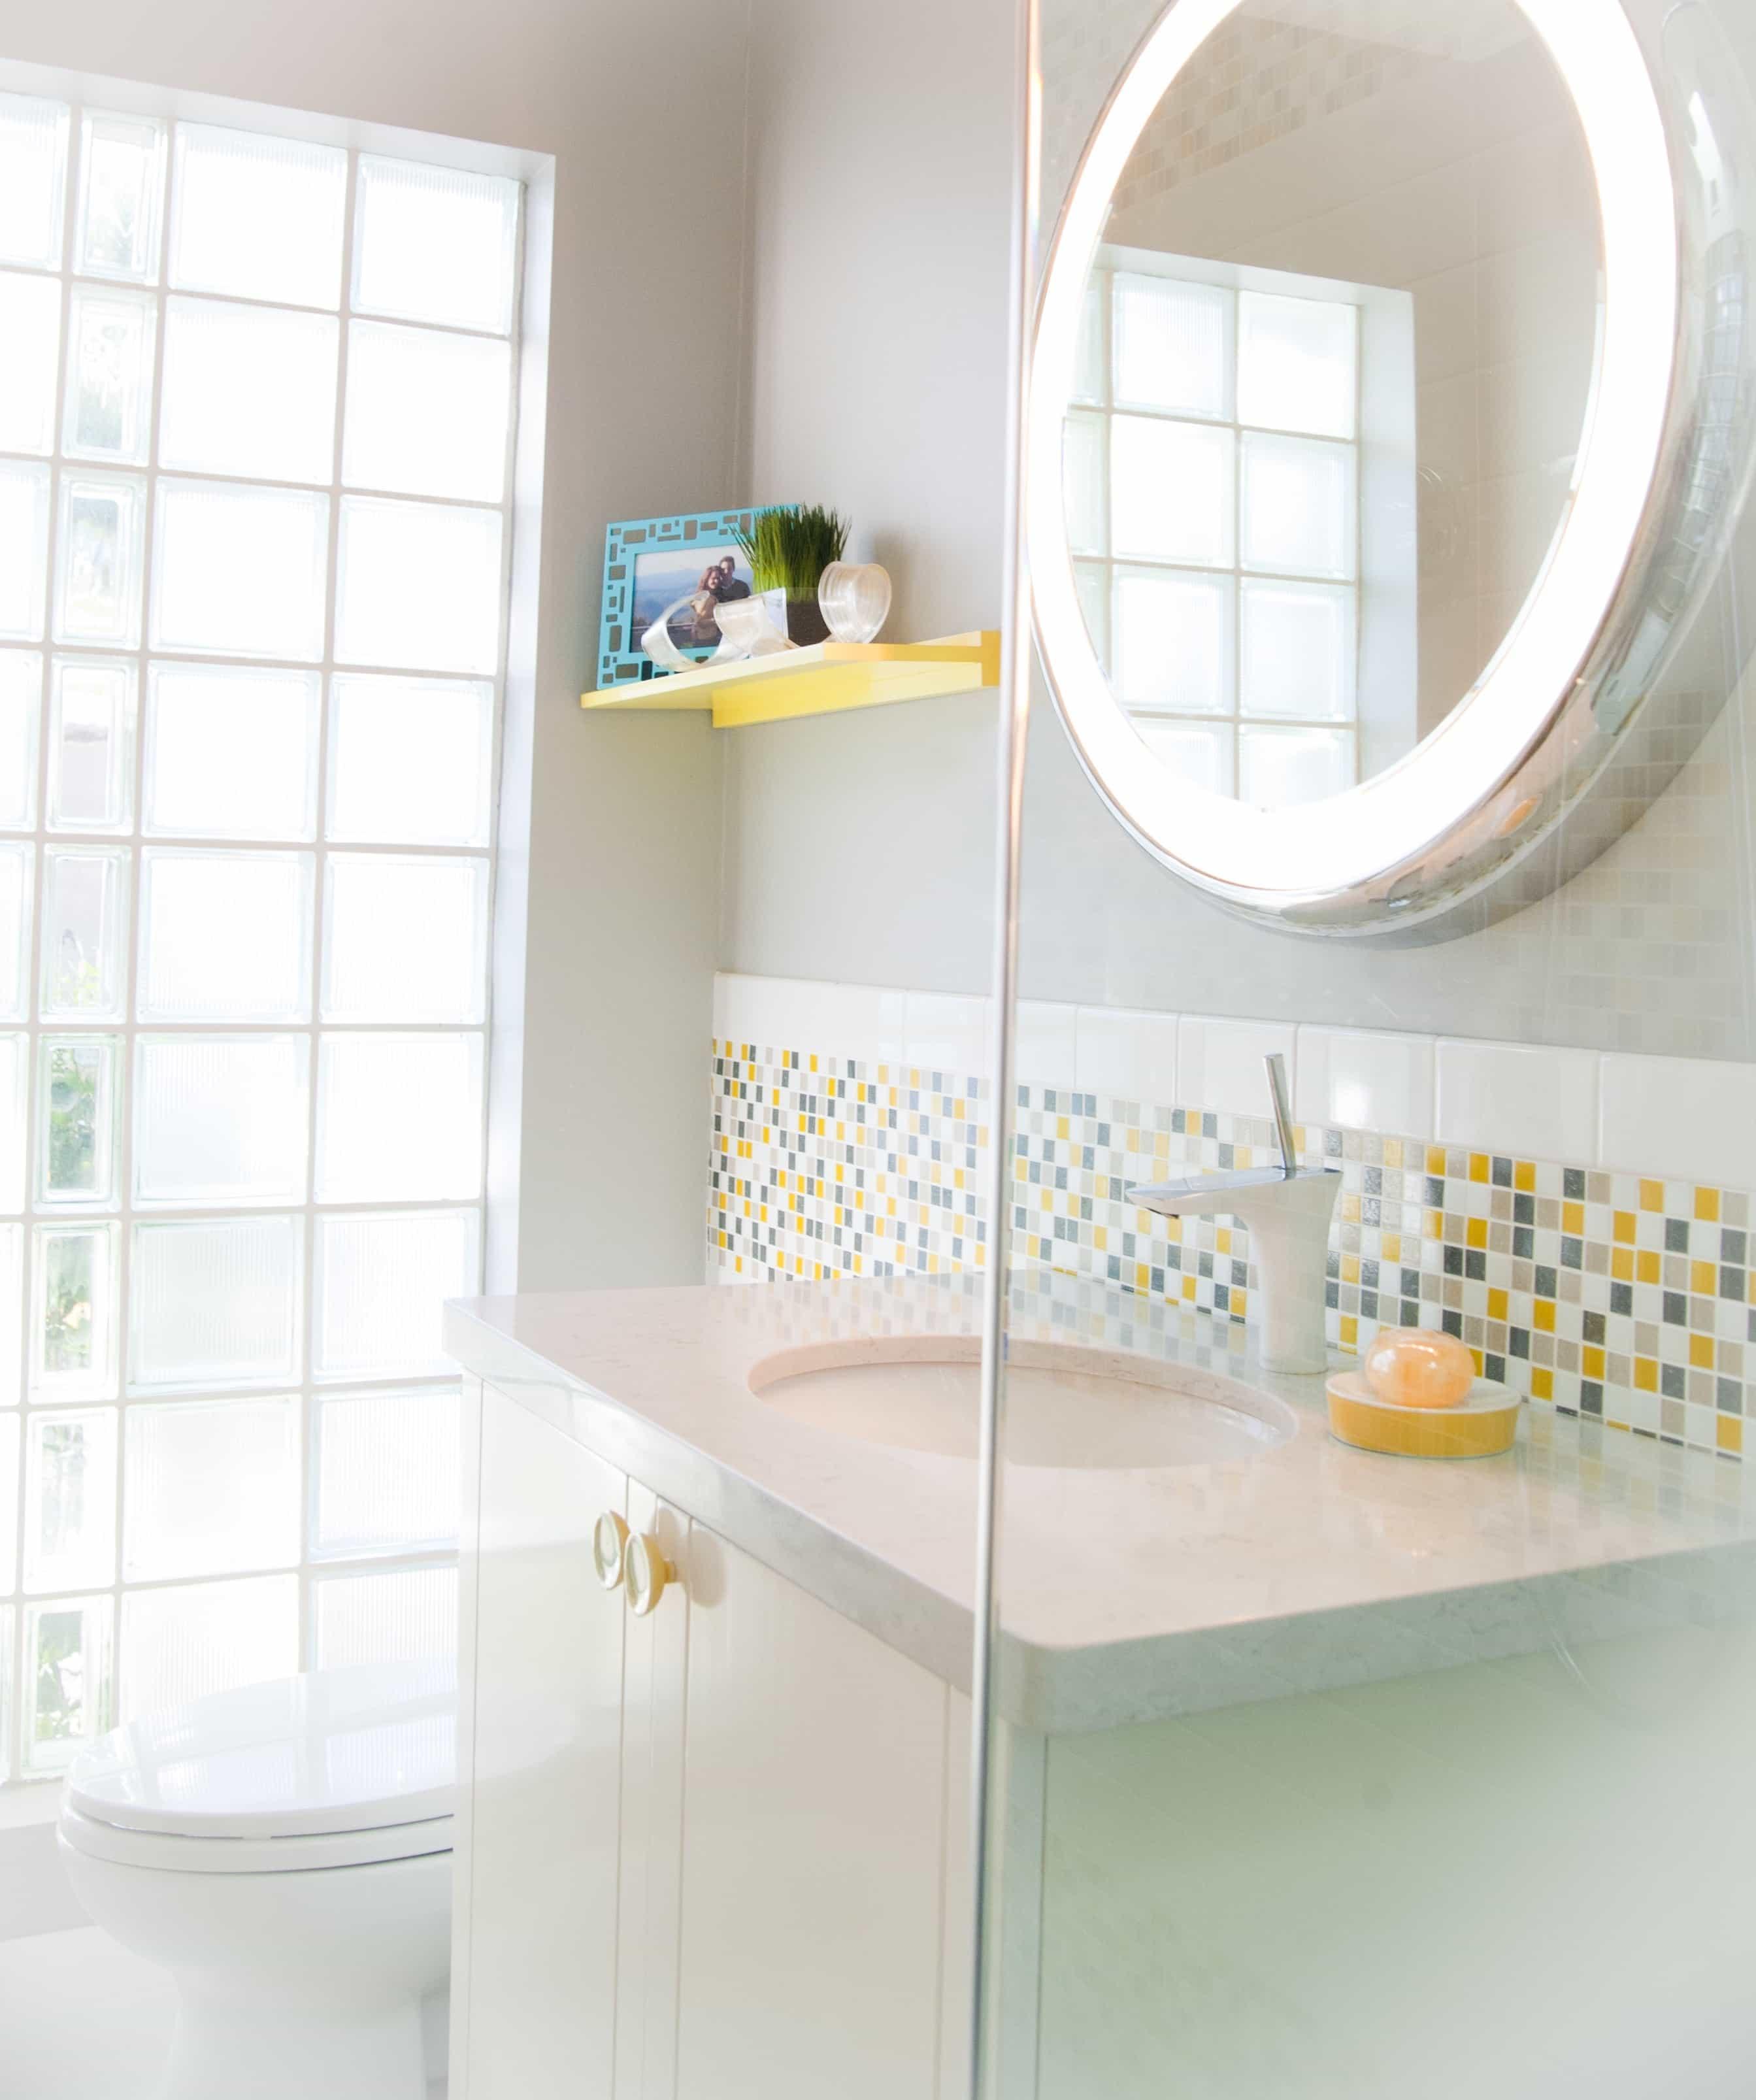 Circular Illuminated Bathroom Mirror